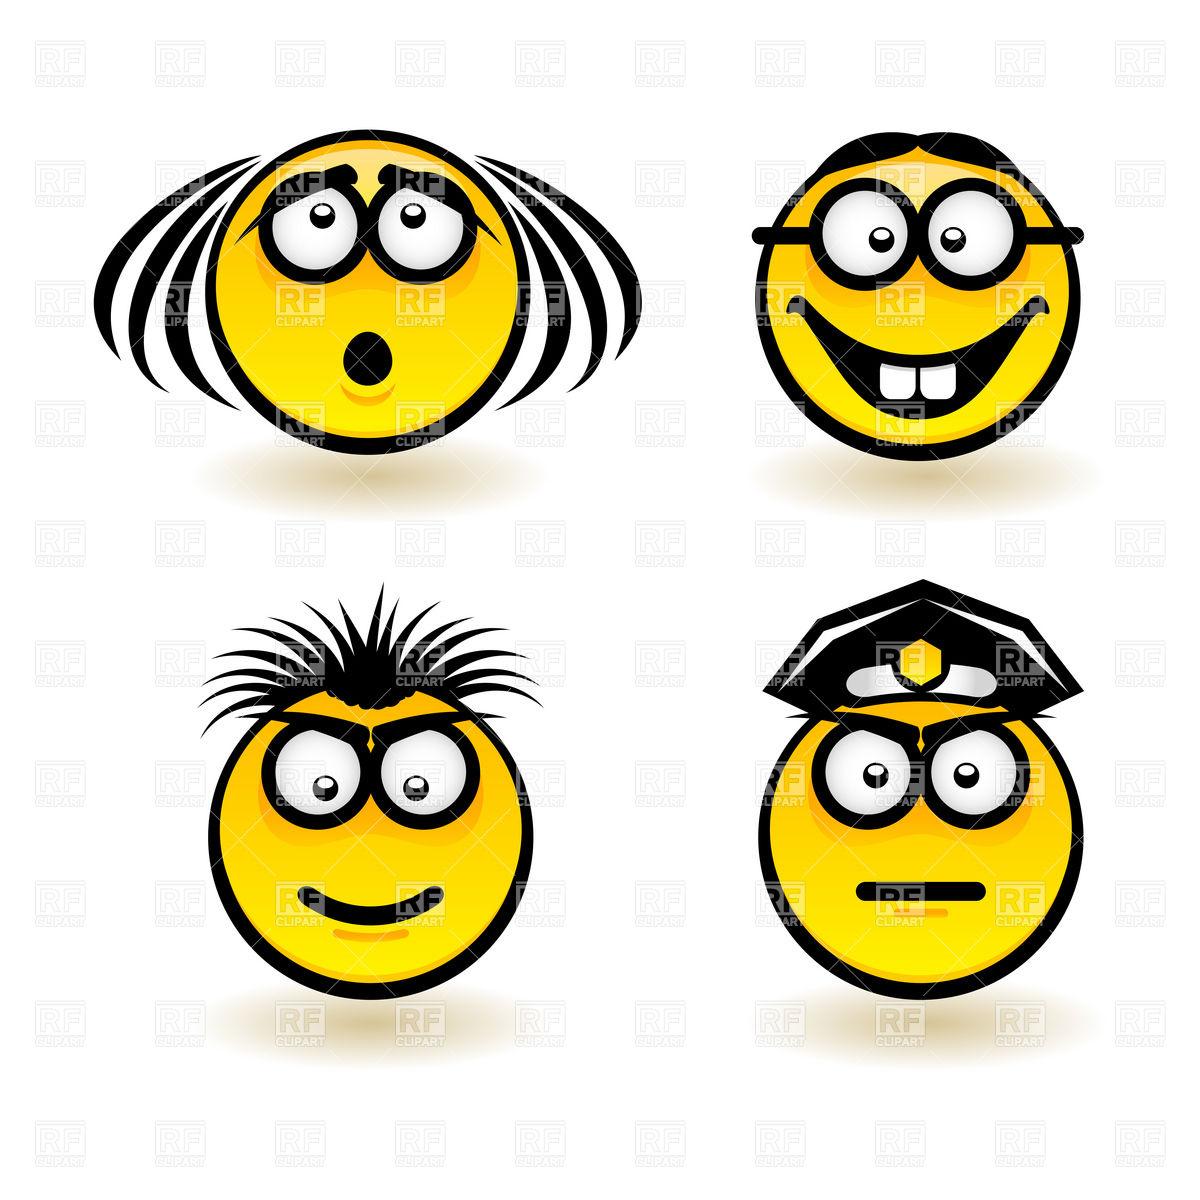 Faces clipart cartoon jpg freeuse library Smile Faces Cartoon   Free download best Smile Faces Cartoon on ... jpg freeuse library